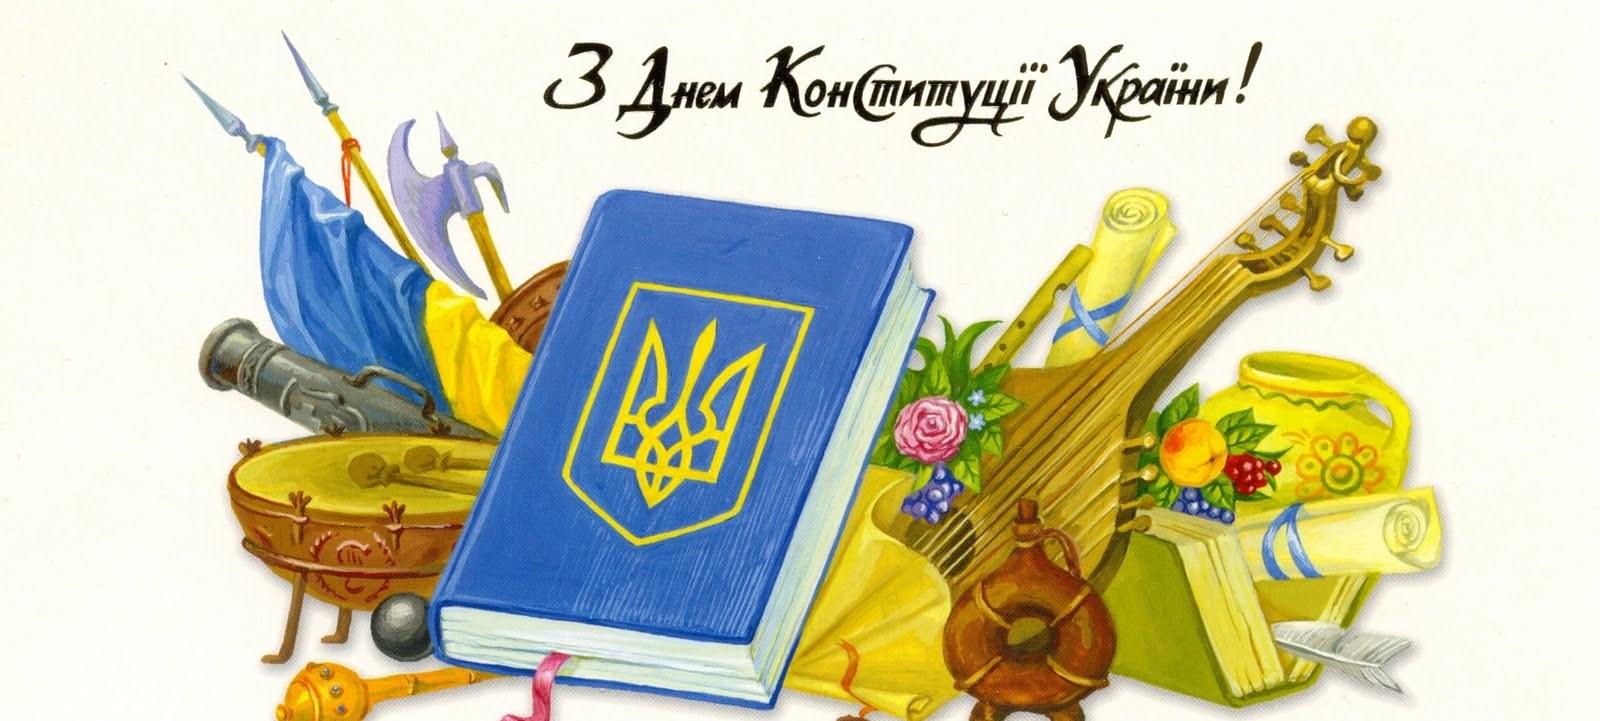 Церковный календарь день валентины день ангела